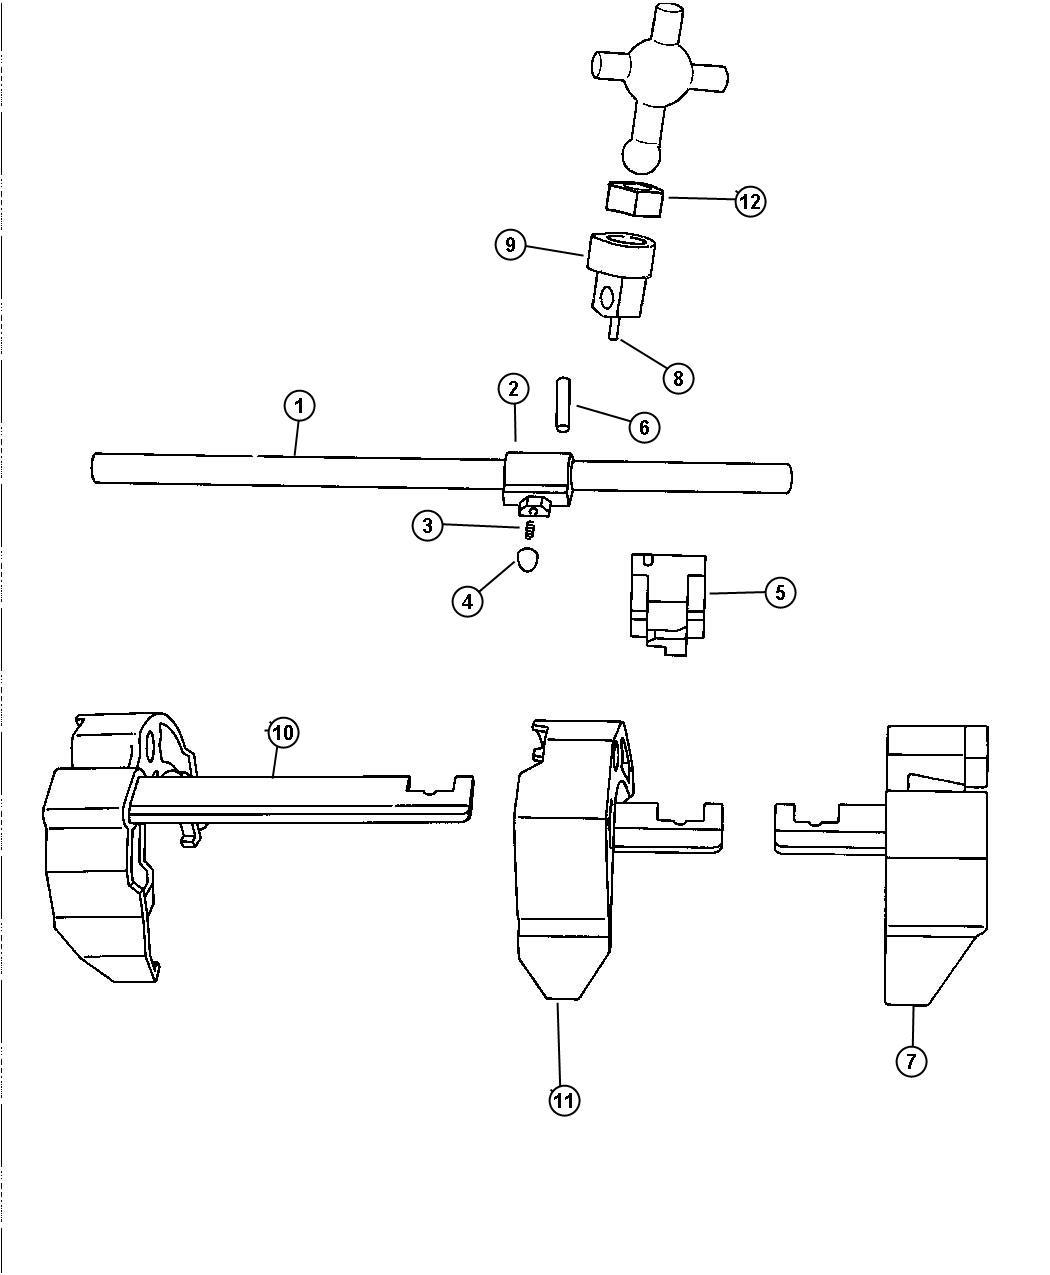 Jeep Wrangler Isolator. Shift lever. Fork, transmission